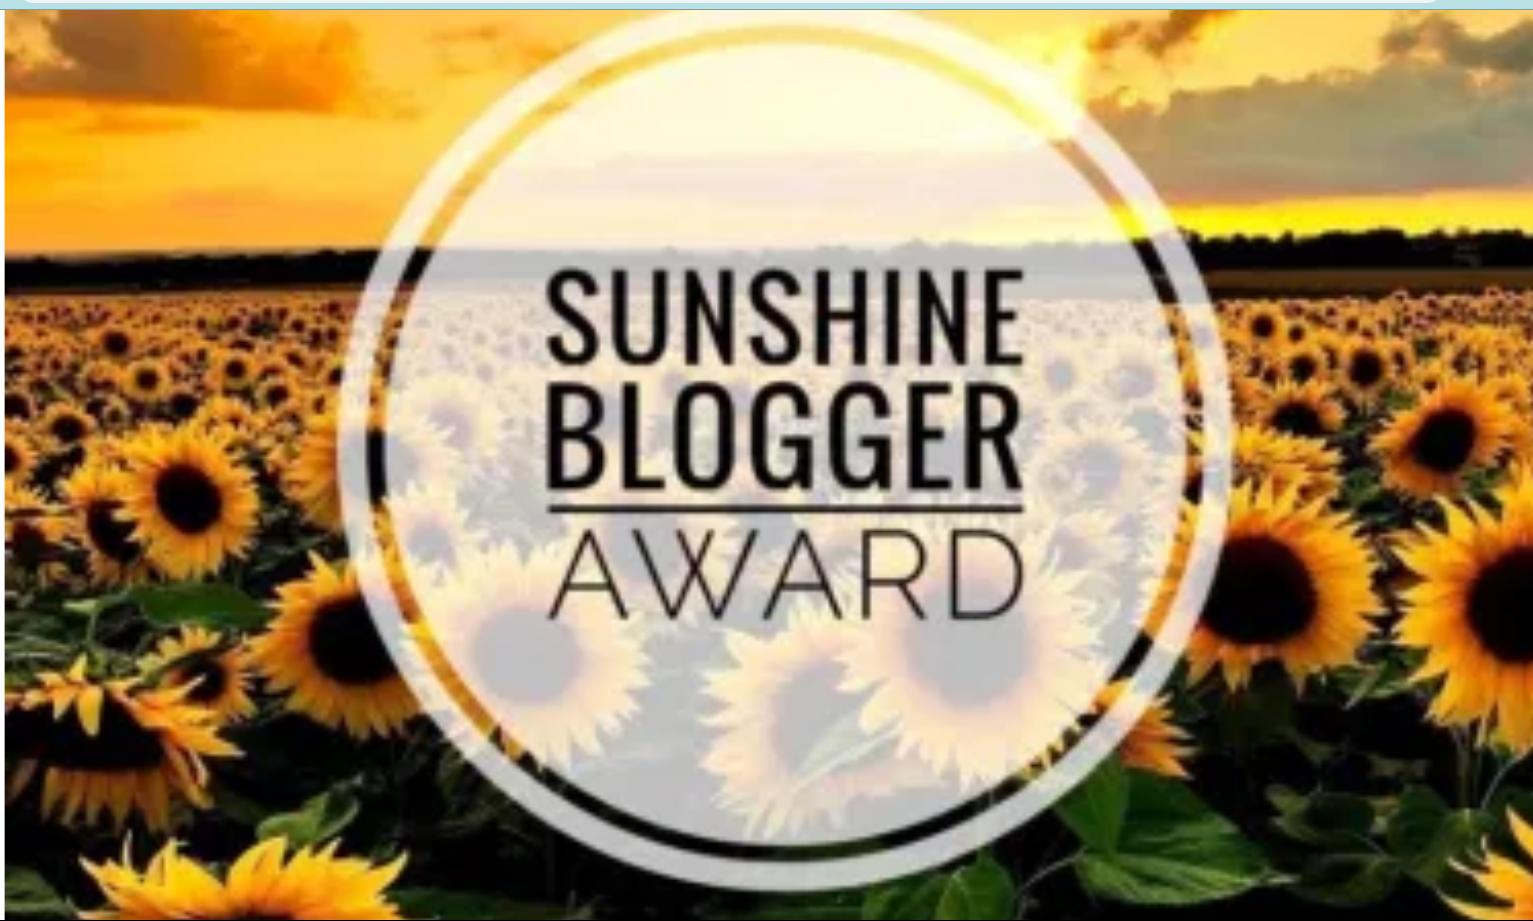 Sunshine Blogger Award motivation inspiration